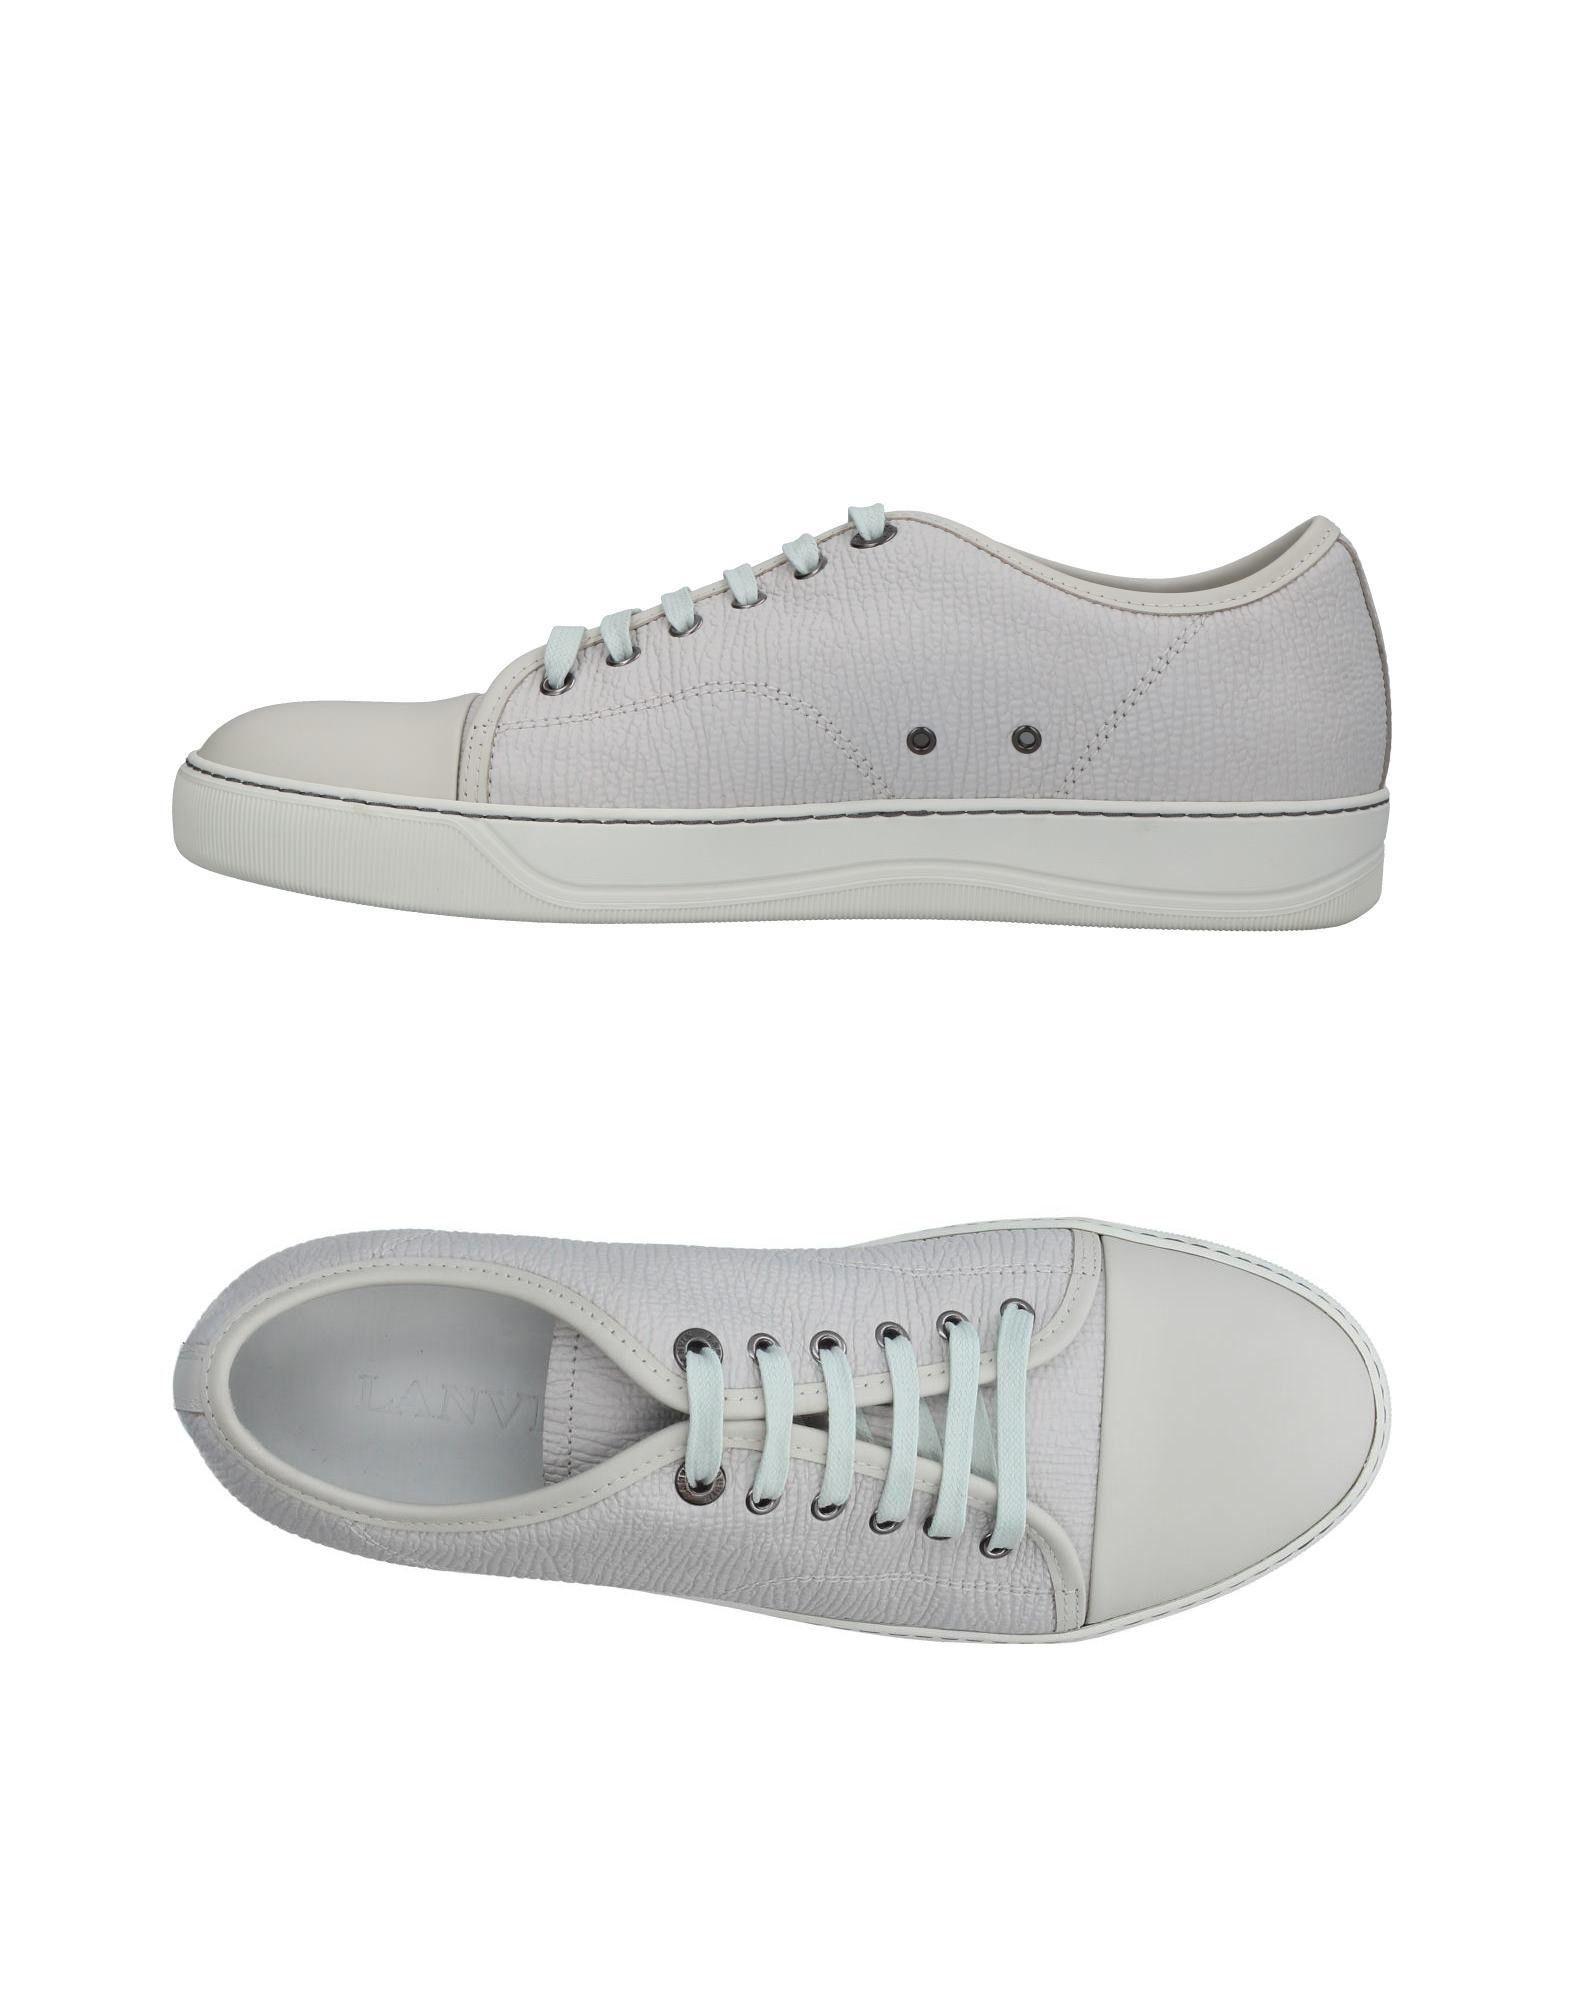 Lanvin Sneakers Herren Qualität  11405605PB Gute Qualität Herren beliebte Schuhe 044521